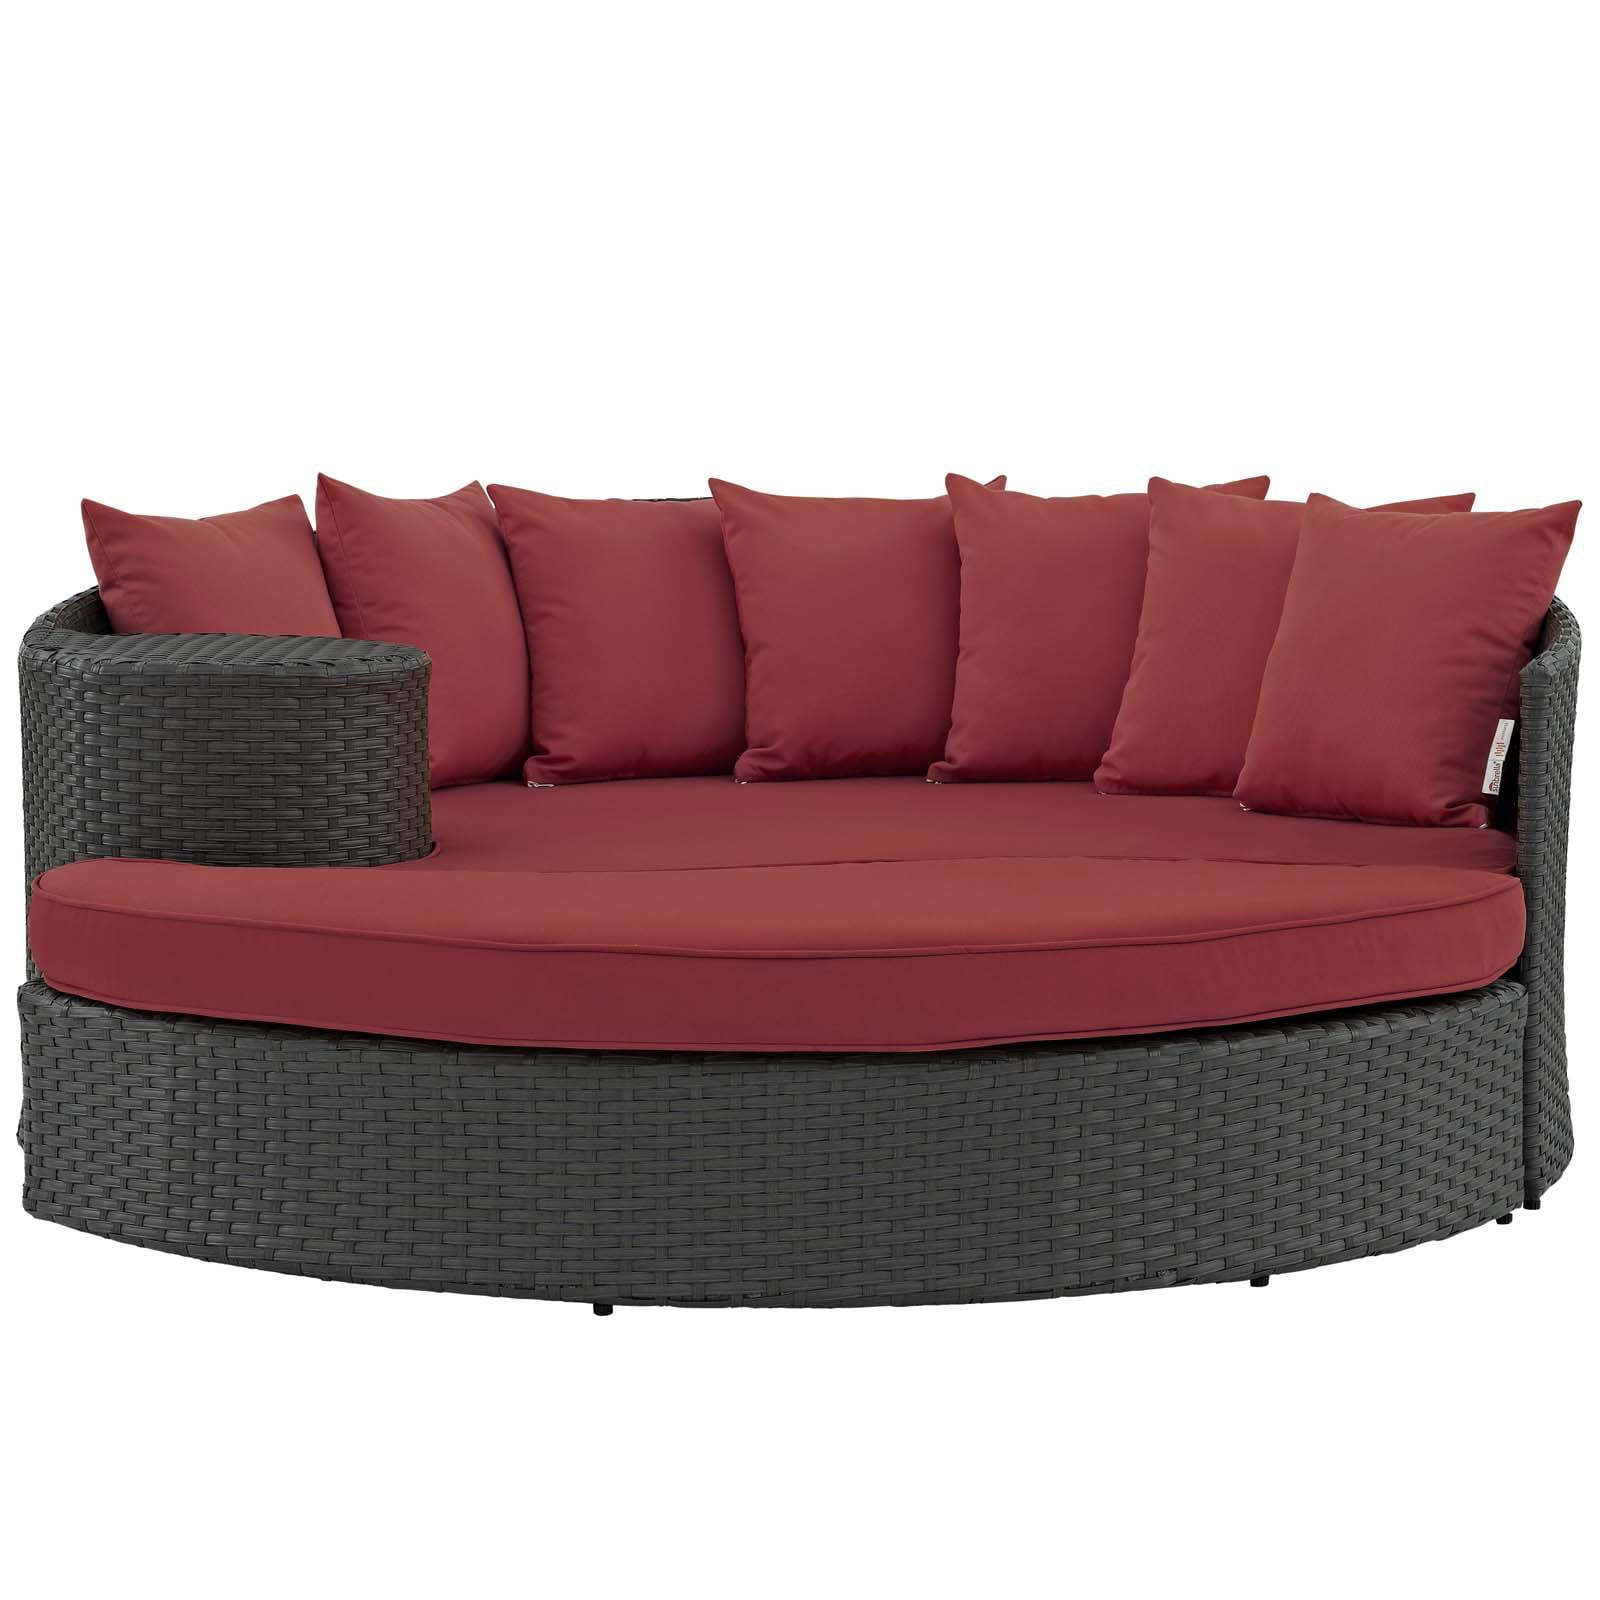 Modern Contemporary Urban Design Outdoor Patio Balcony Garden Furniture  Lounge Daybed Sofa Bed, Sunbrella Rattan Wicker, Red